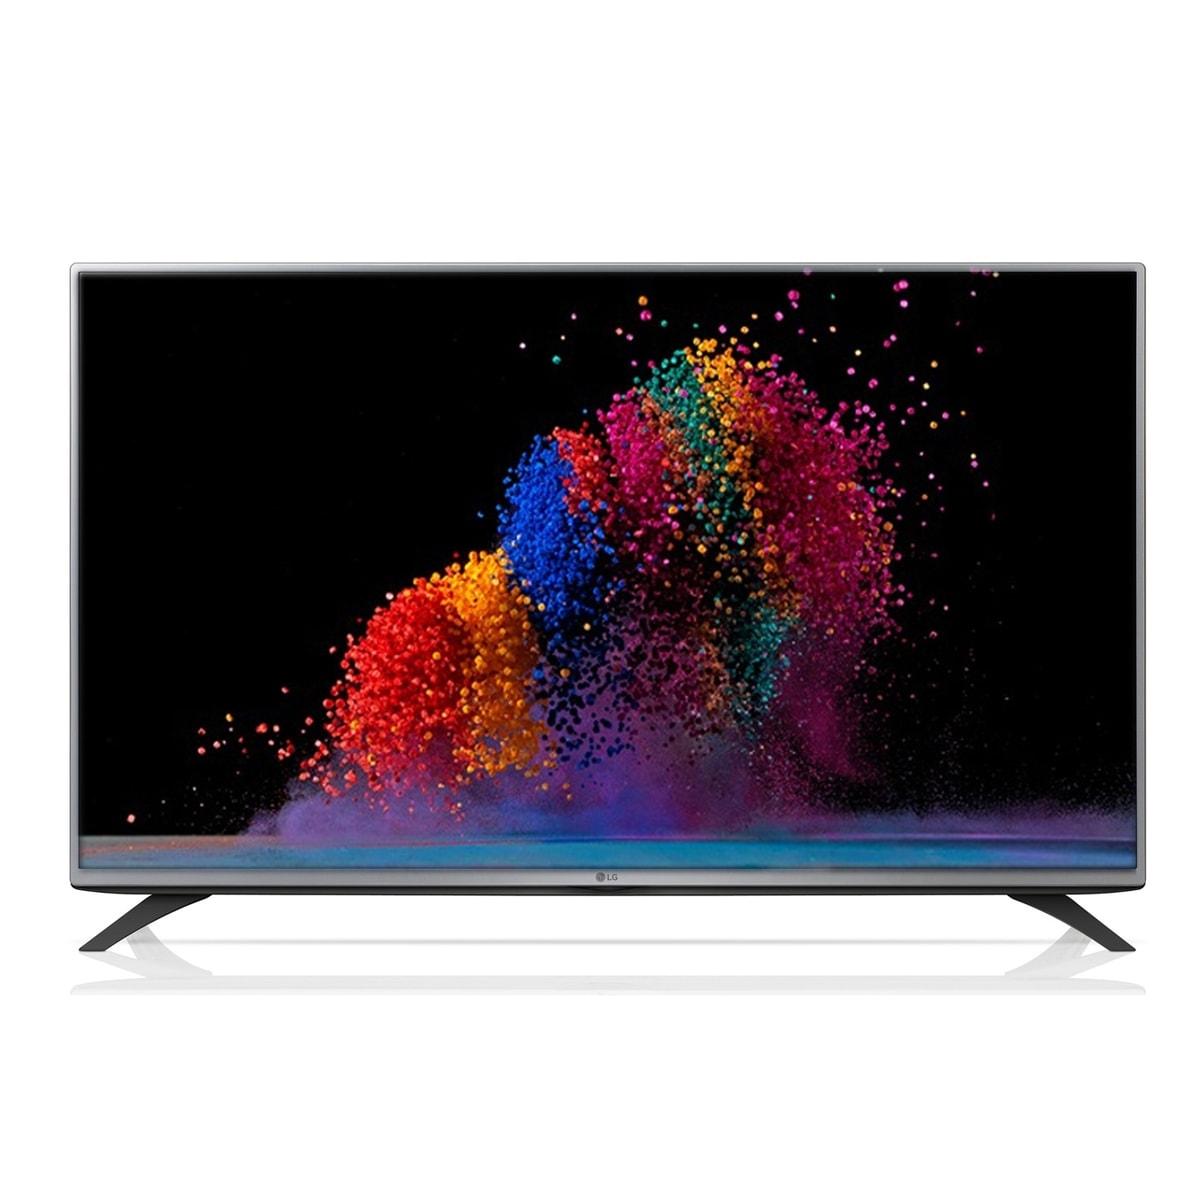 LG 49LF5400 (49LF5400 (8806087237238)) - Achat / Vente TV sur Cybertek.fr - 2